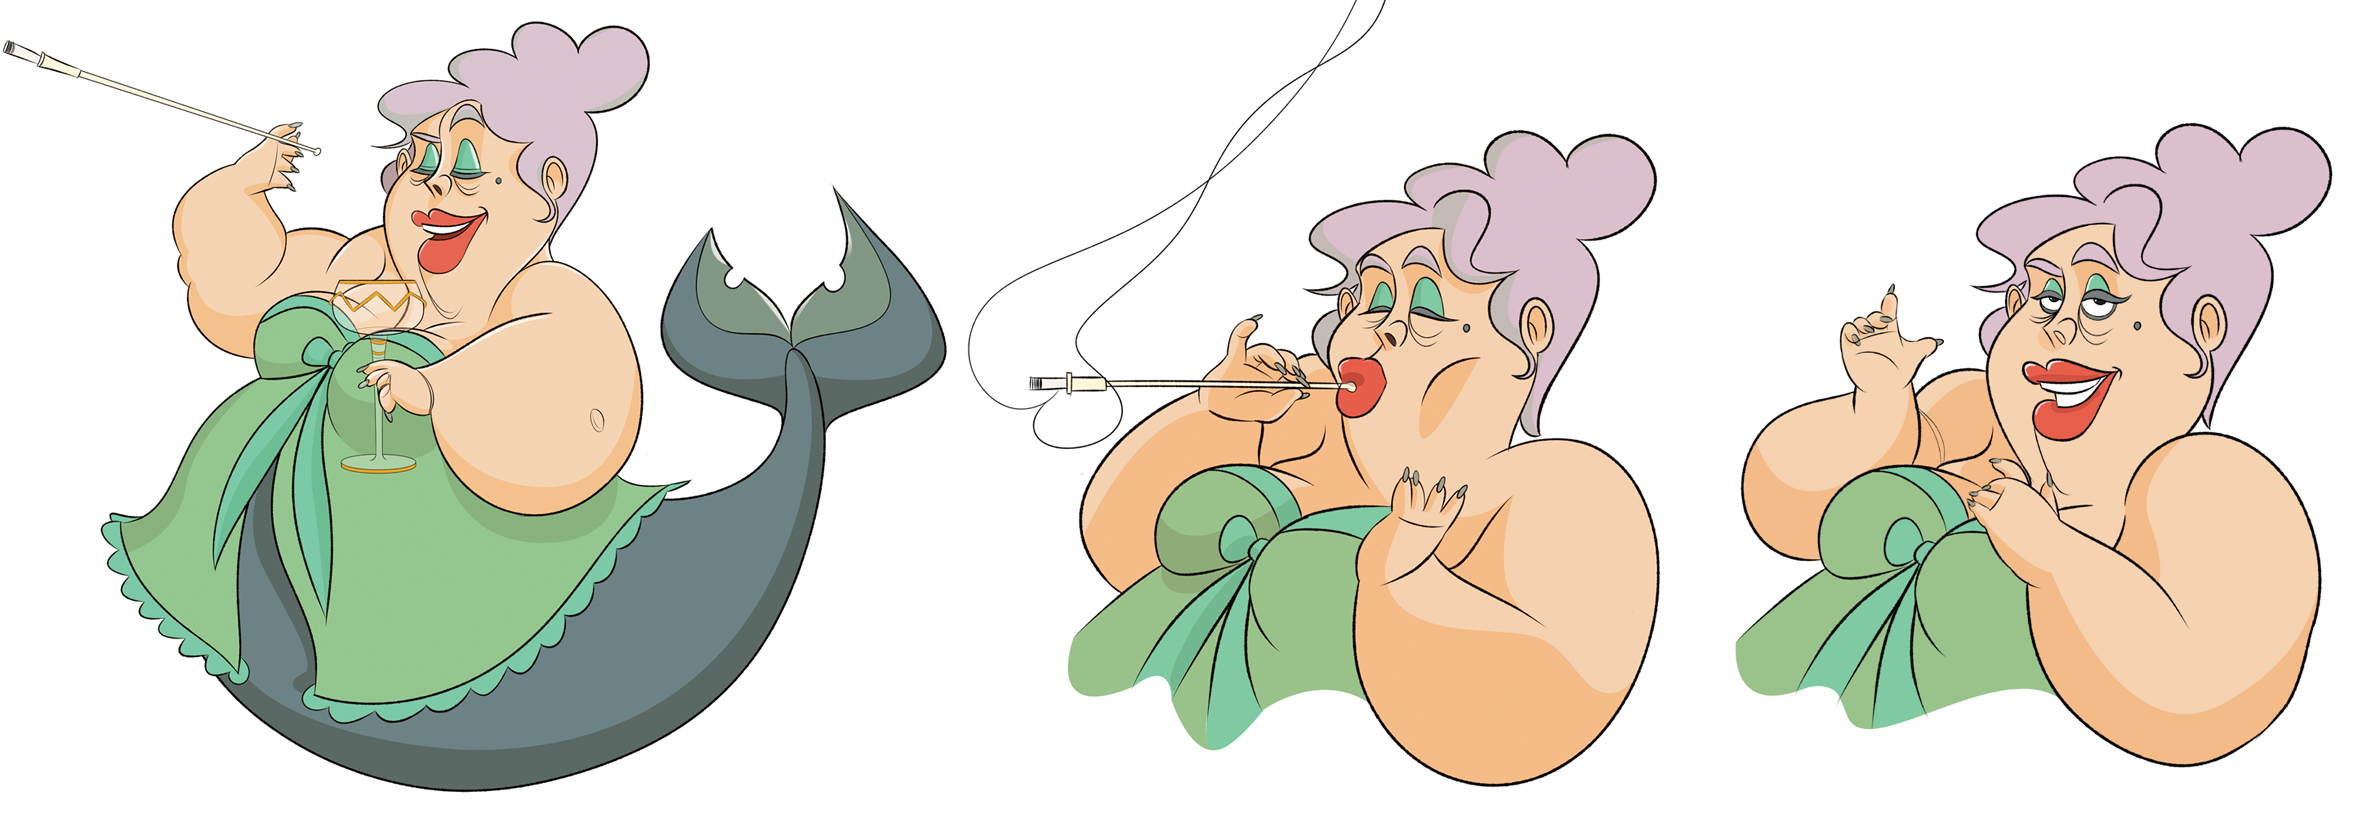 Sirena03